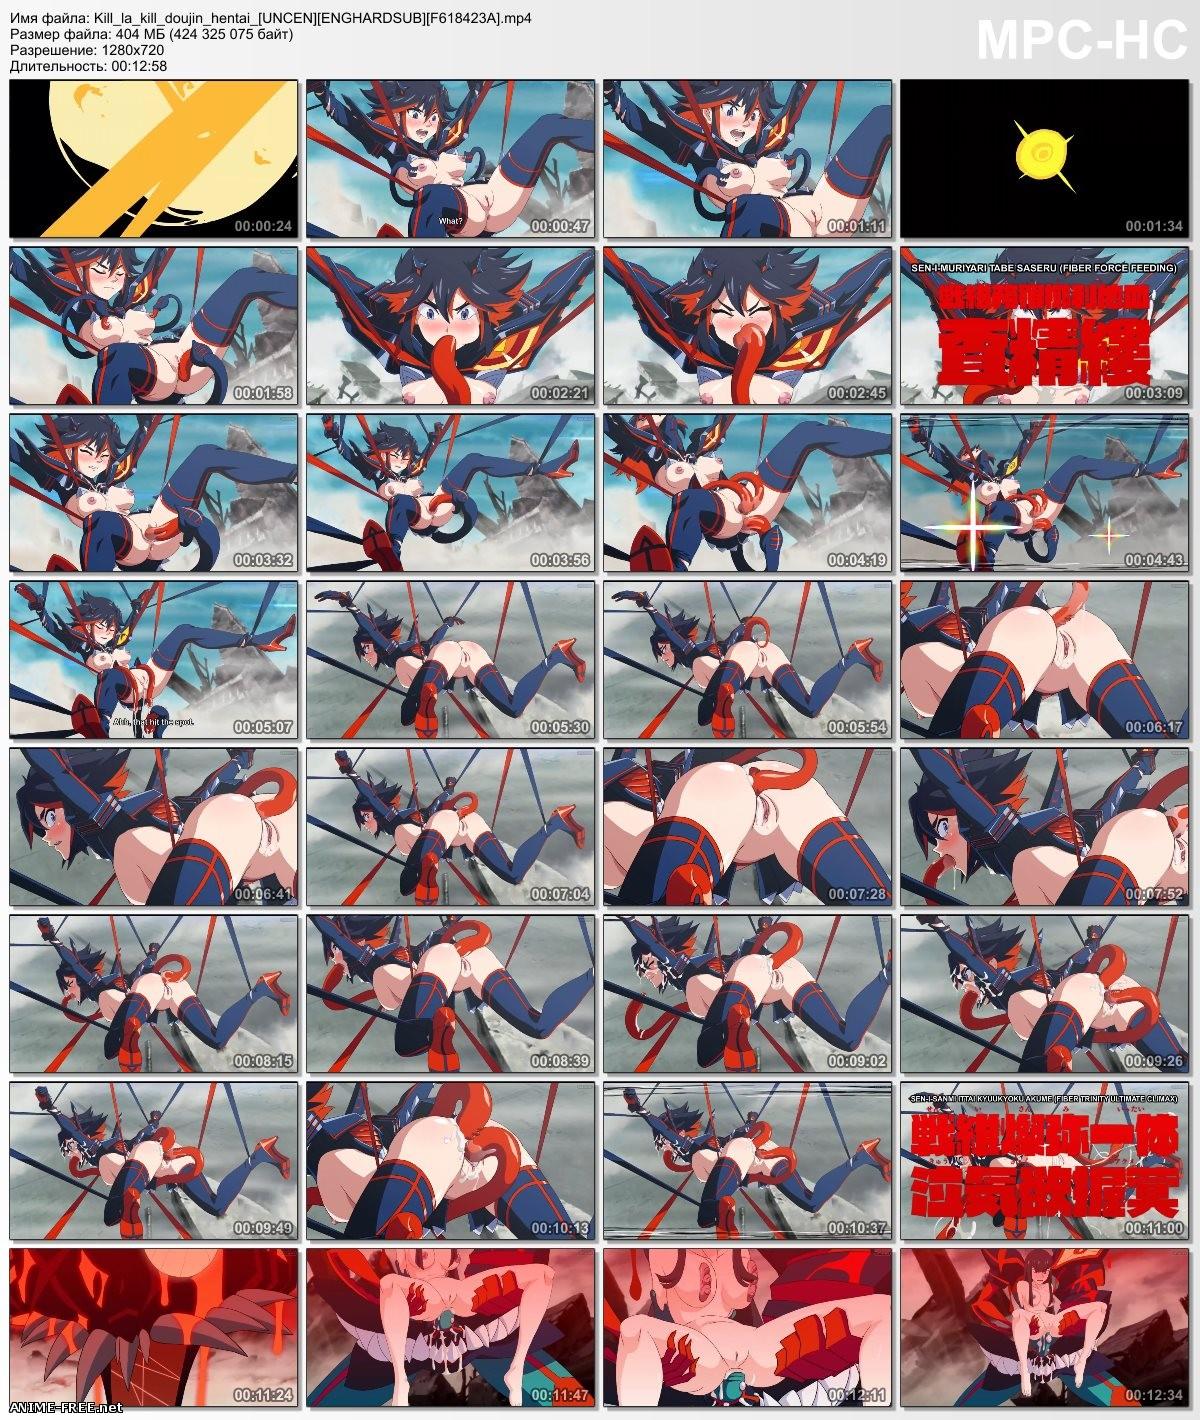 Kill la Kill (Matoi Ryuko) [Ep.1] [720p] [JAP,ENG] Anime Hentai